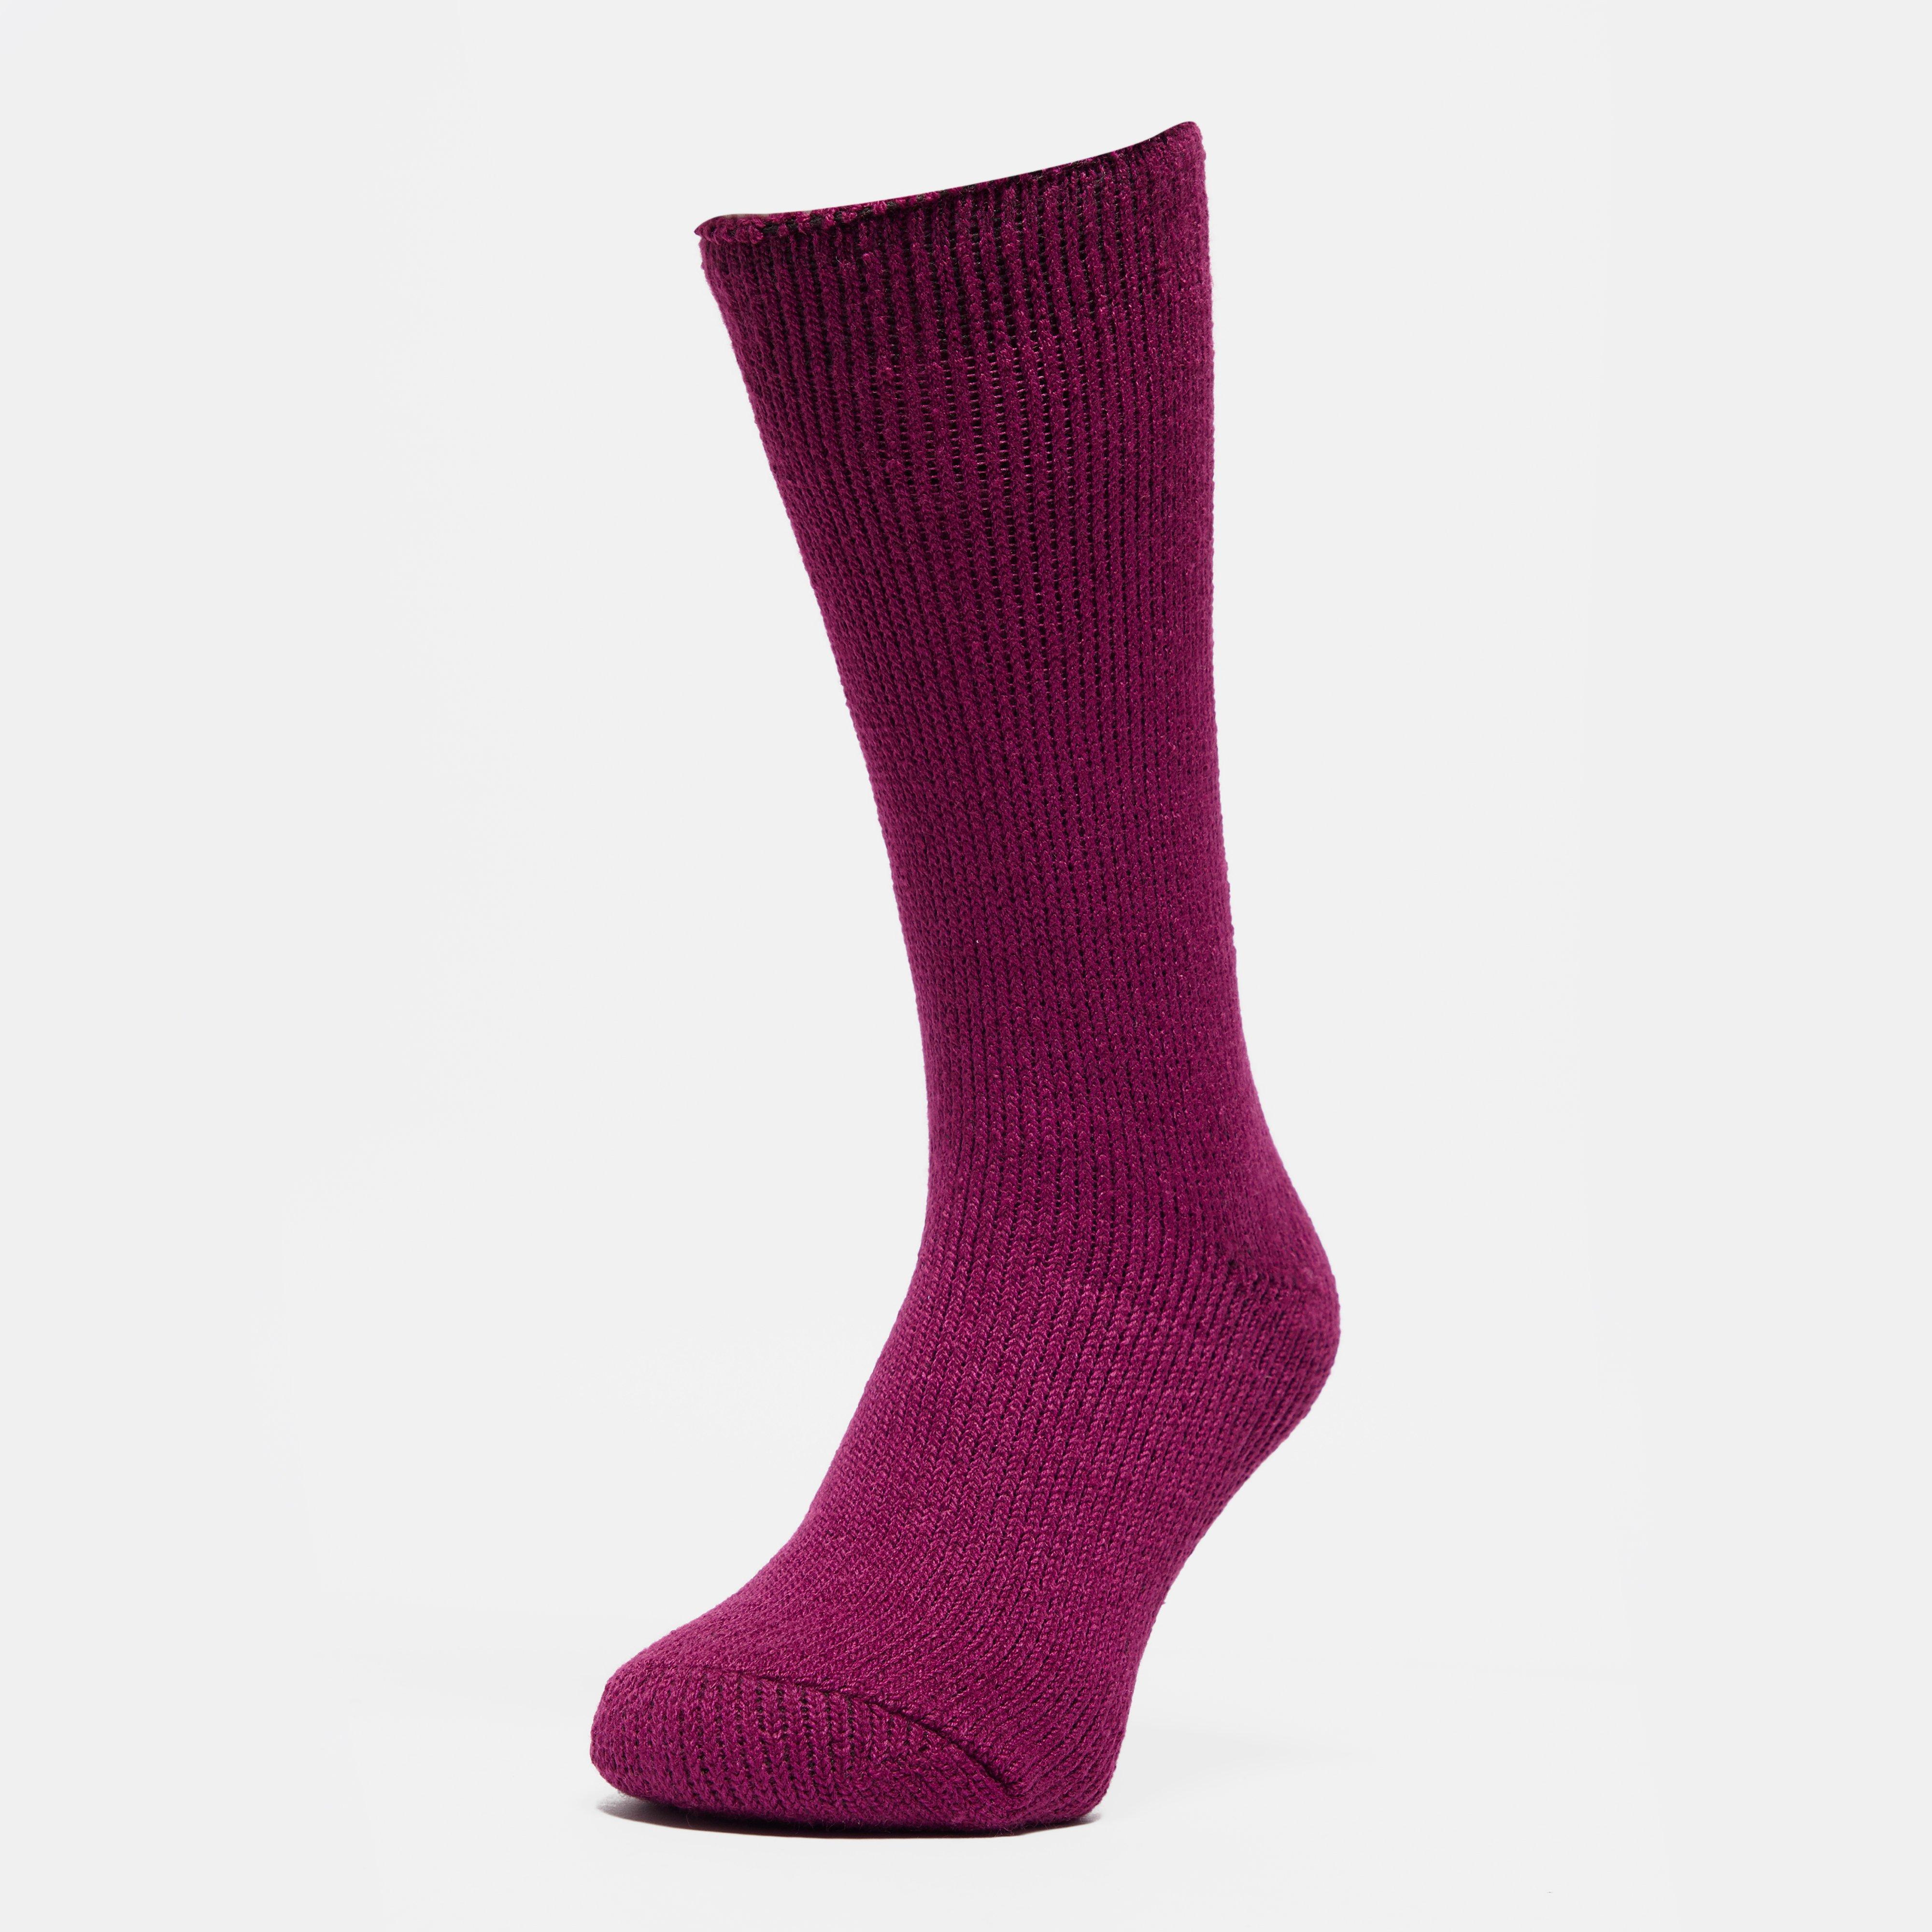 Heat Holders Women's Original Thermal Socks, Pink